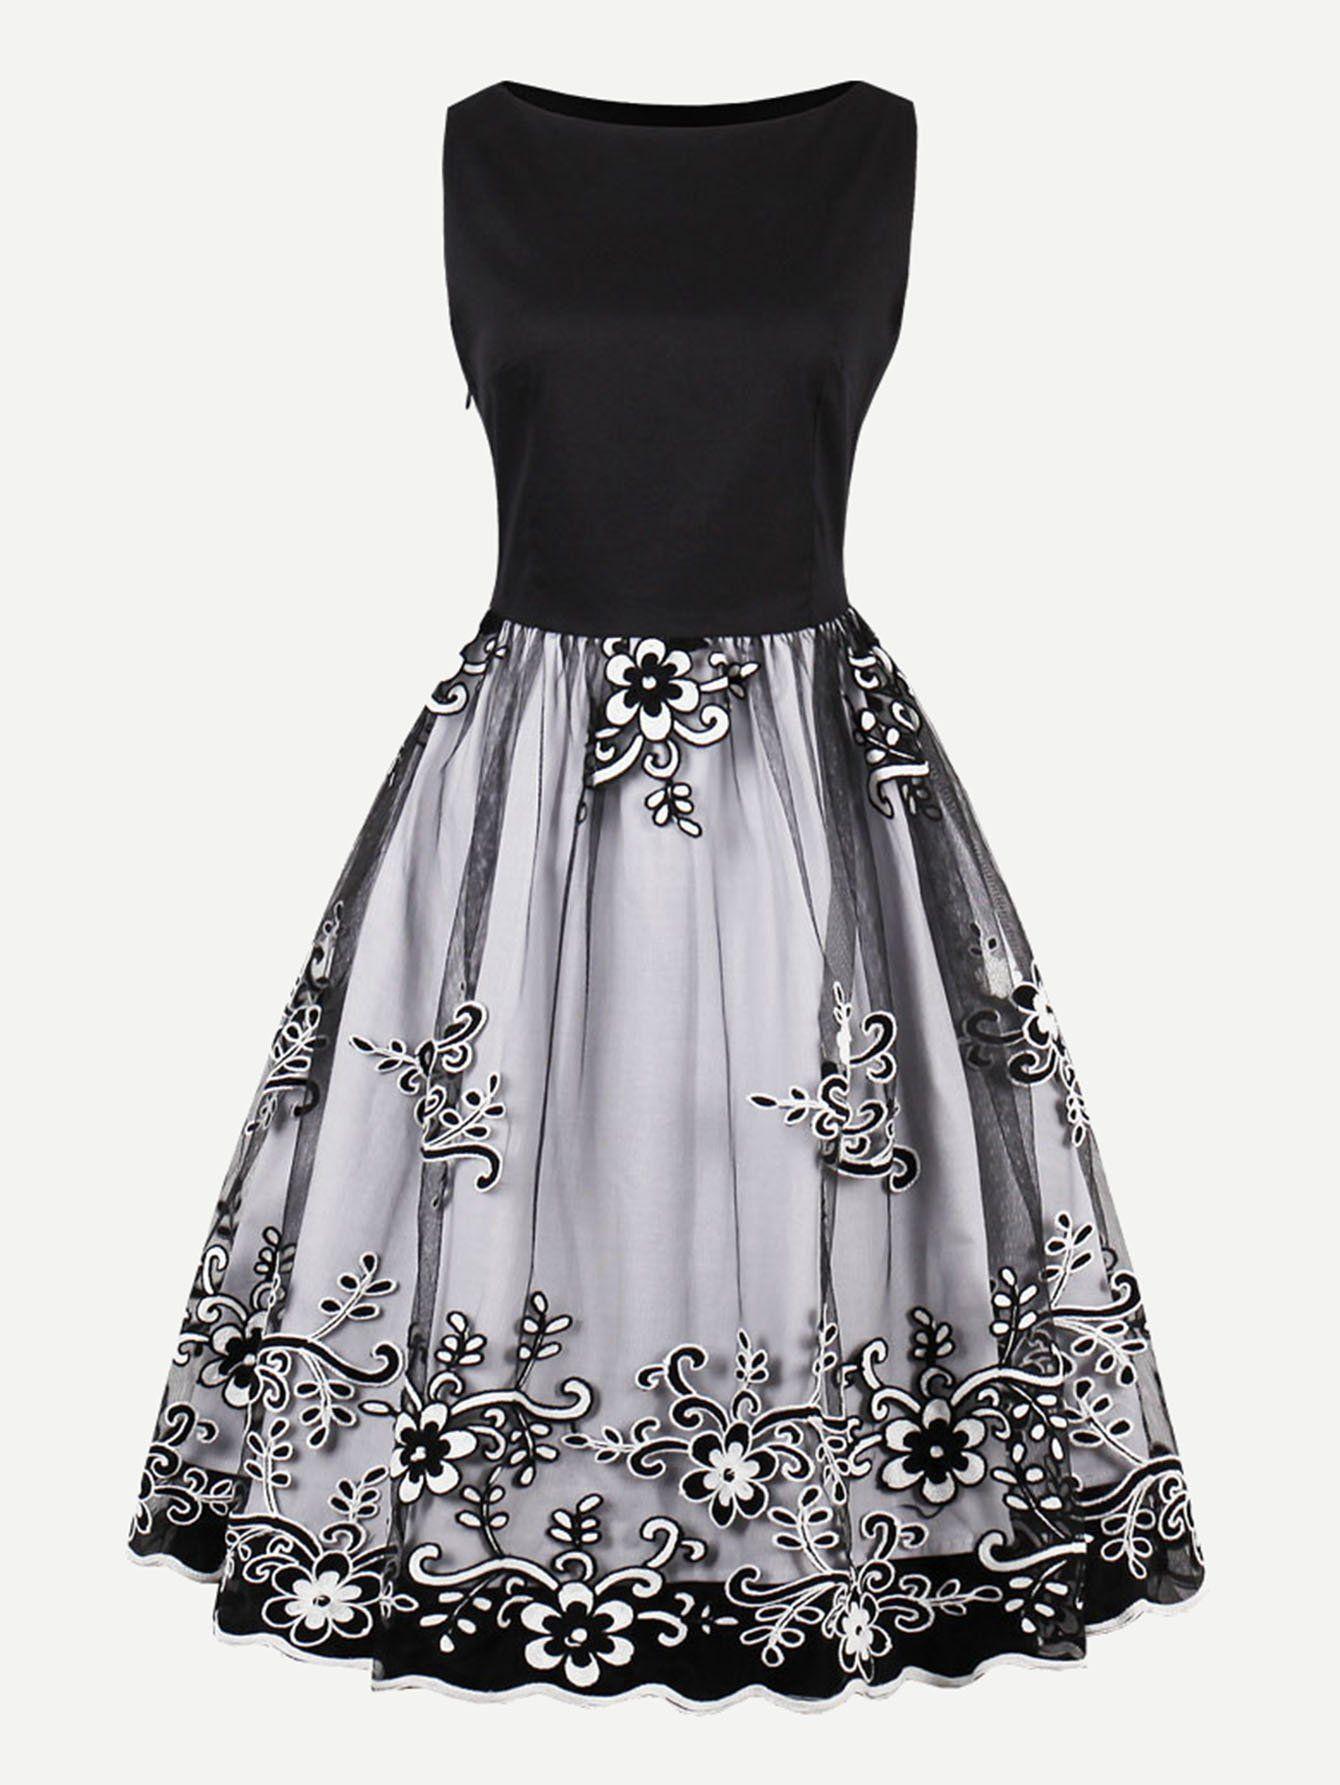 19b167019500 Flower Embroidered Mesh Overlay Combo Dress -SheIn(Sheinside ...